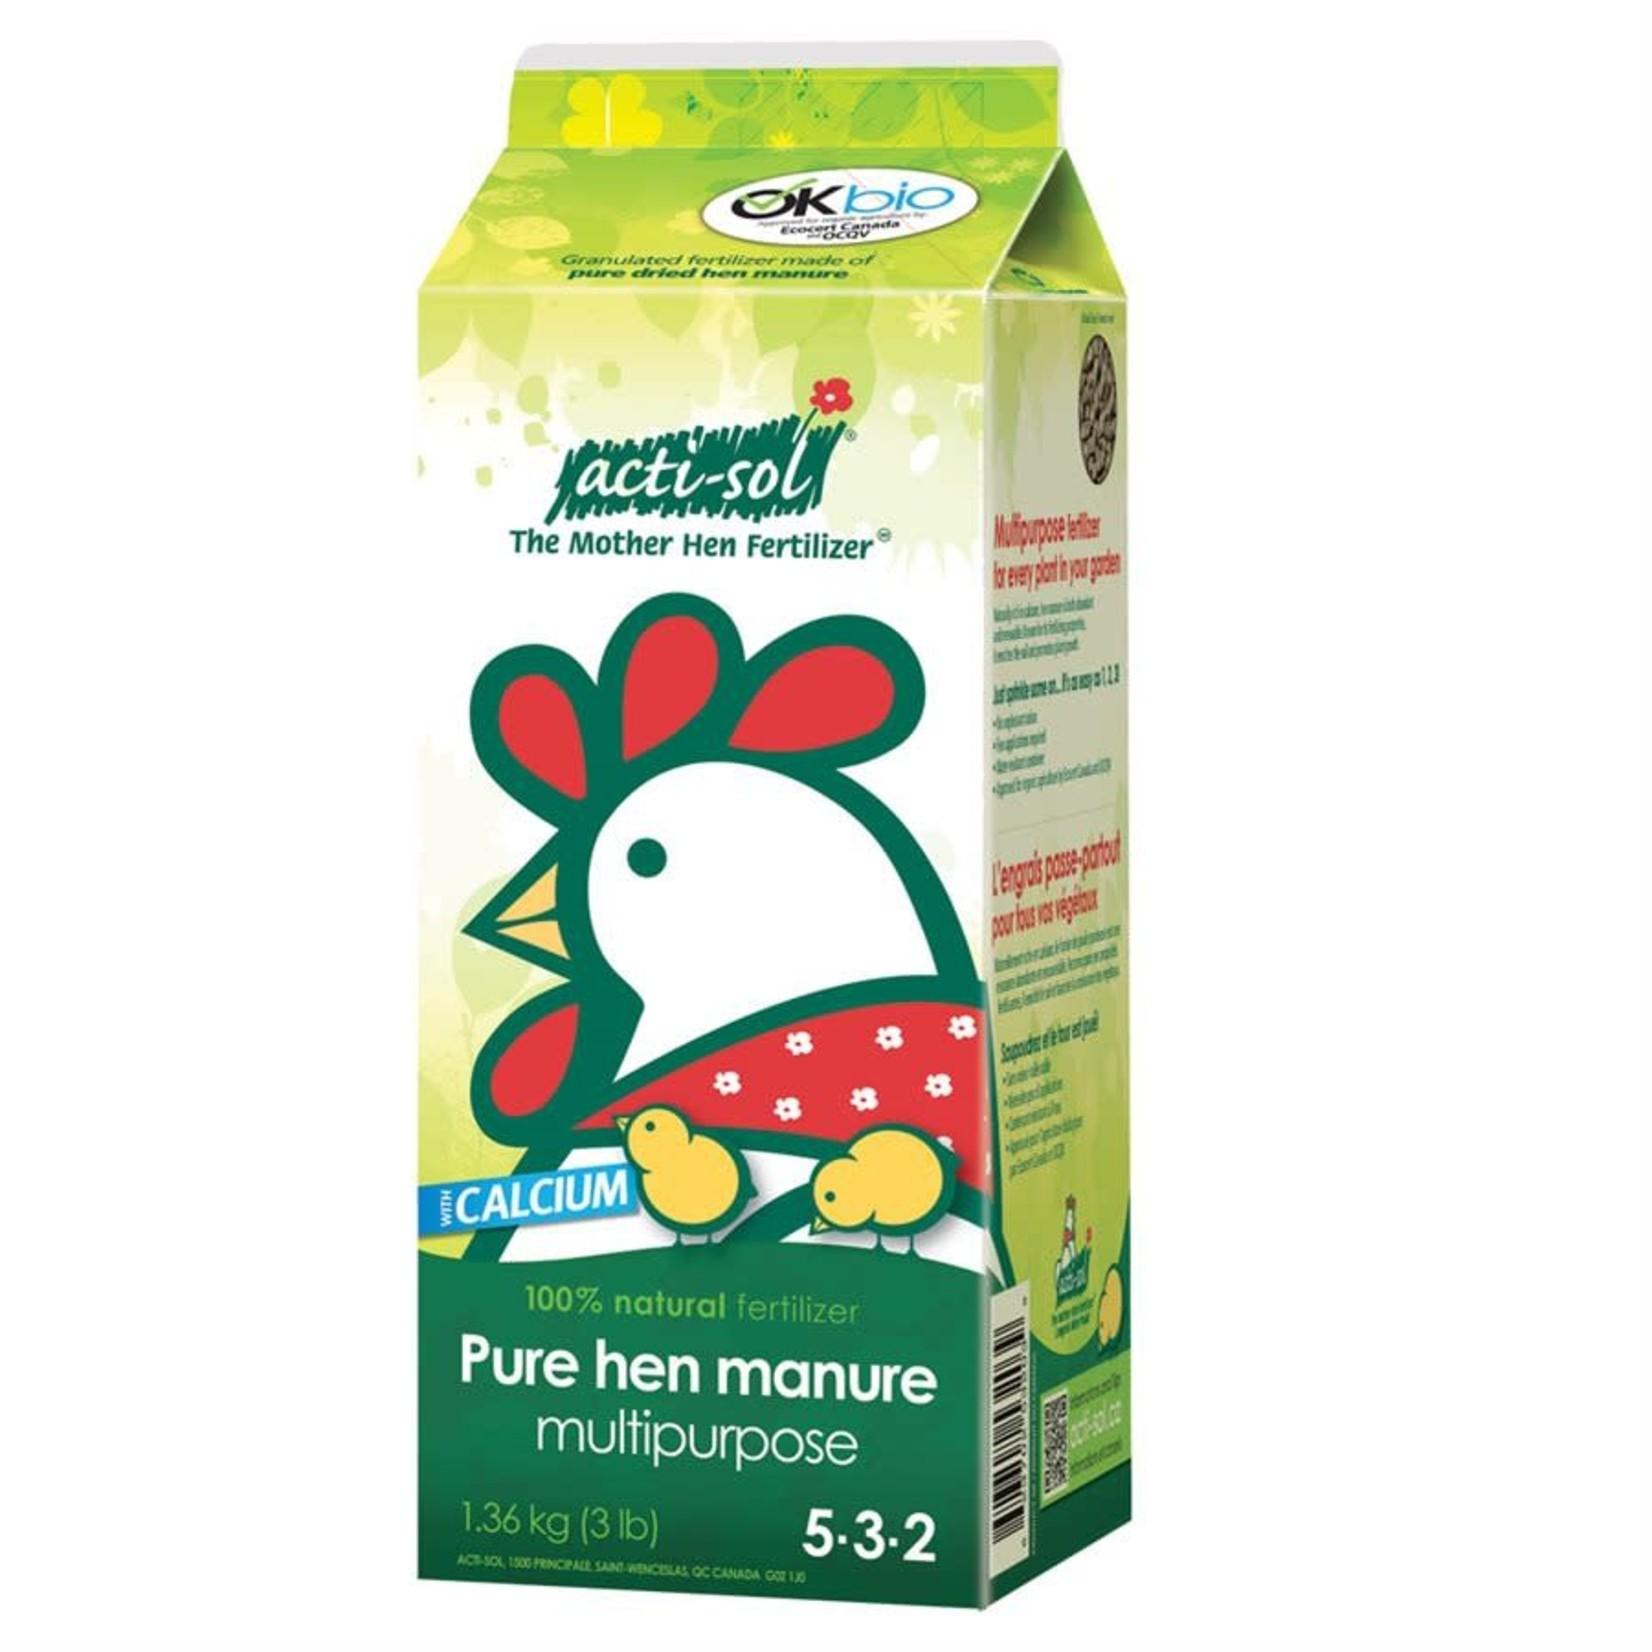 Pure Hen Manure - Multipurpose 5-3-2 (1.36 kg)